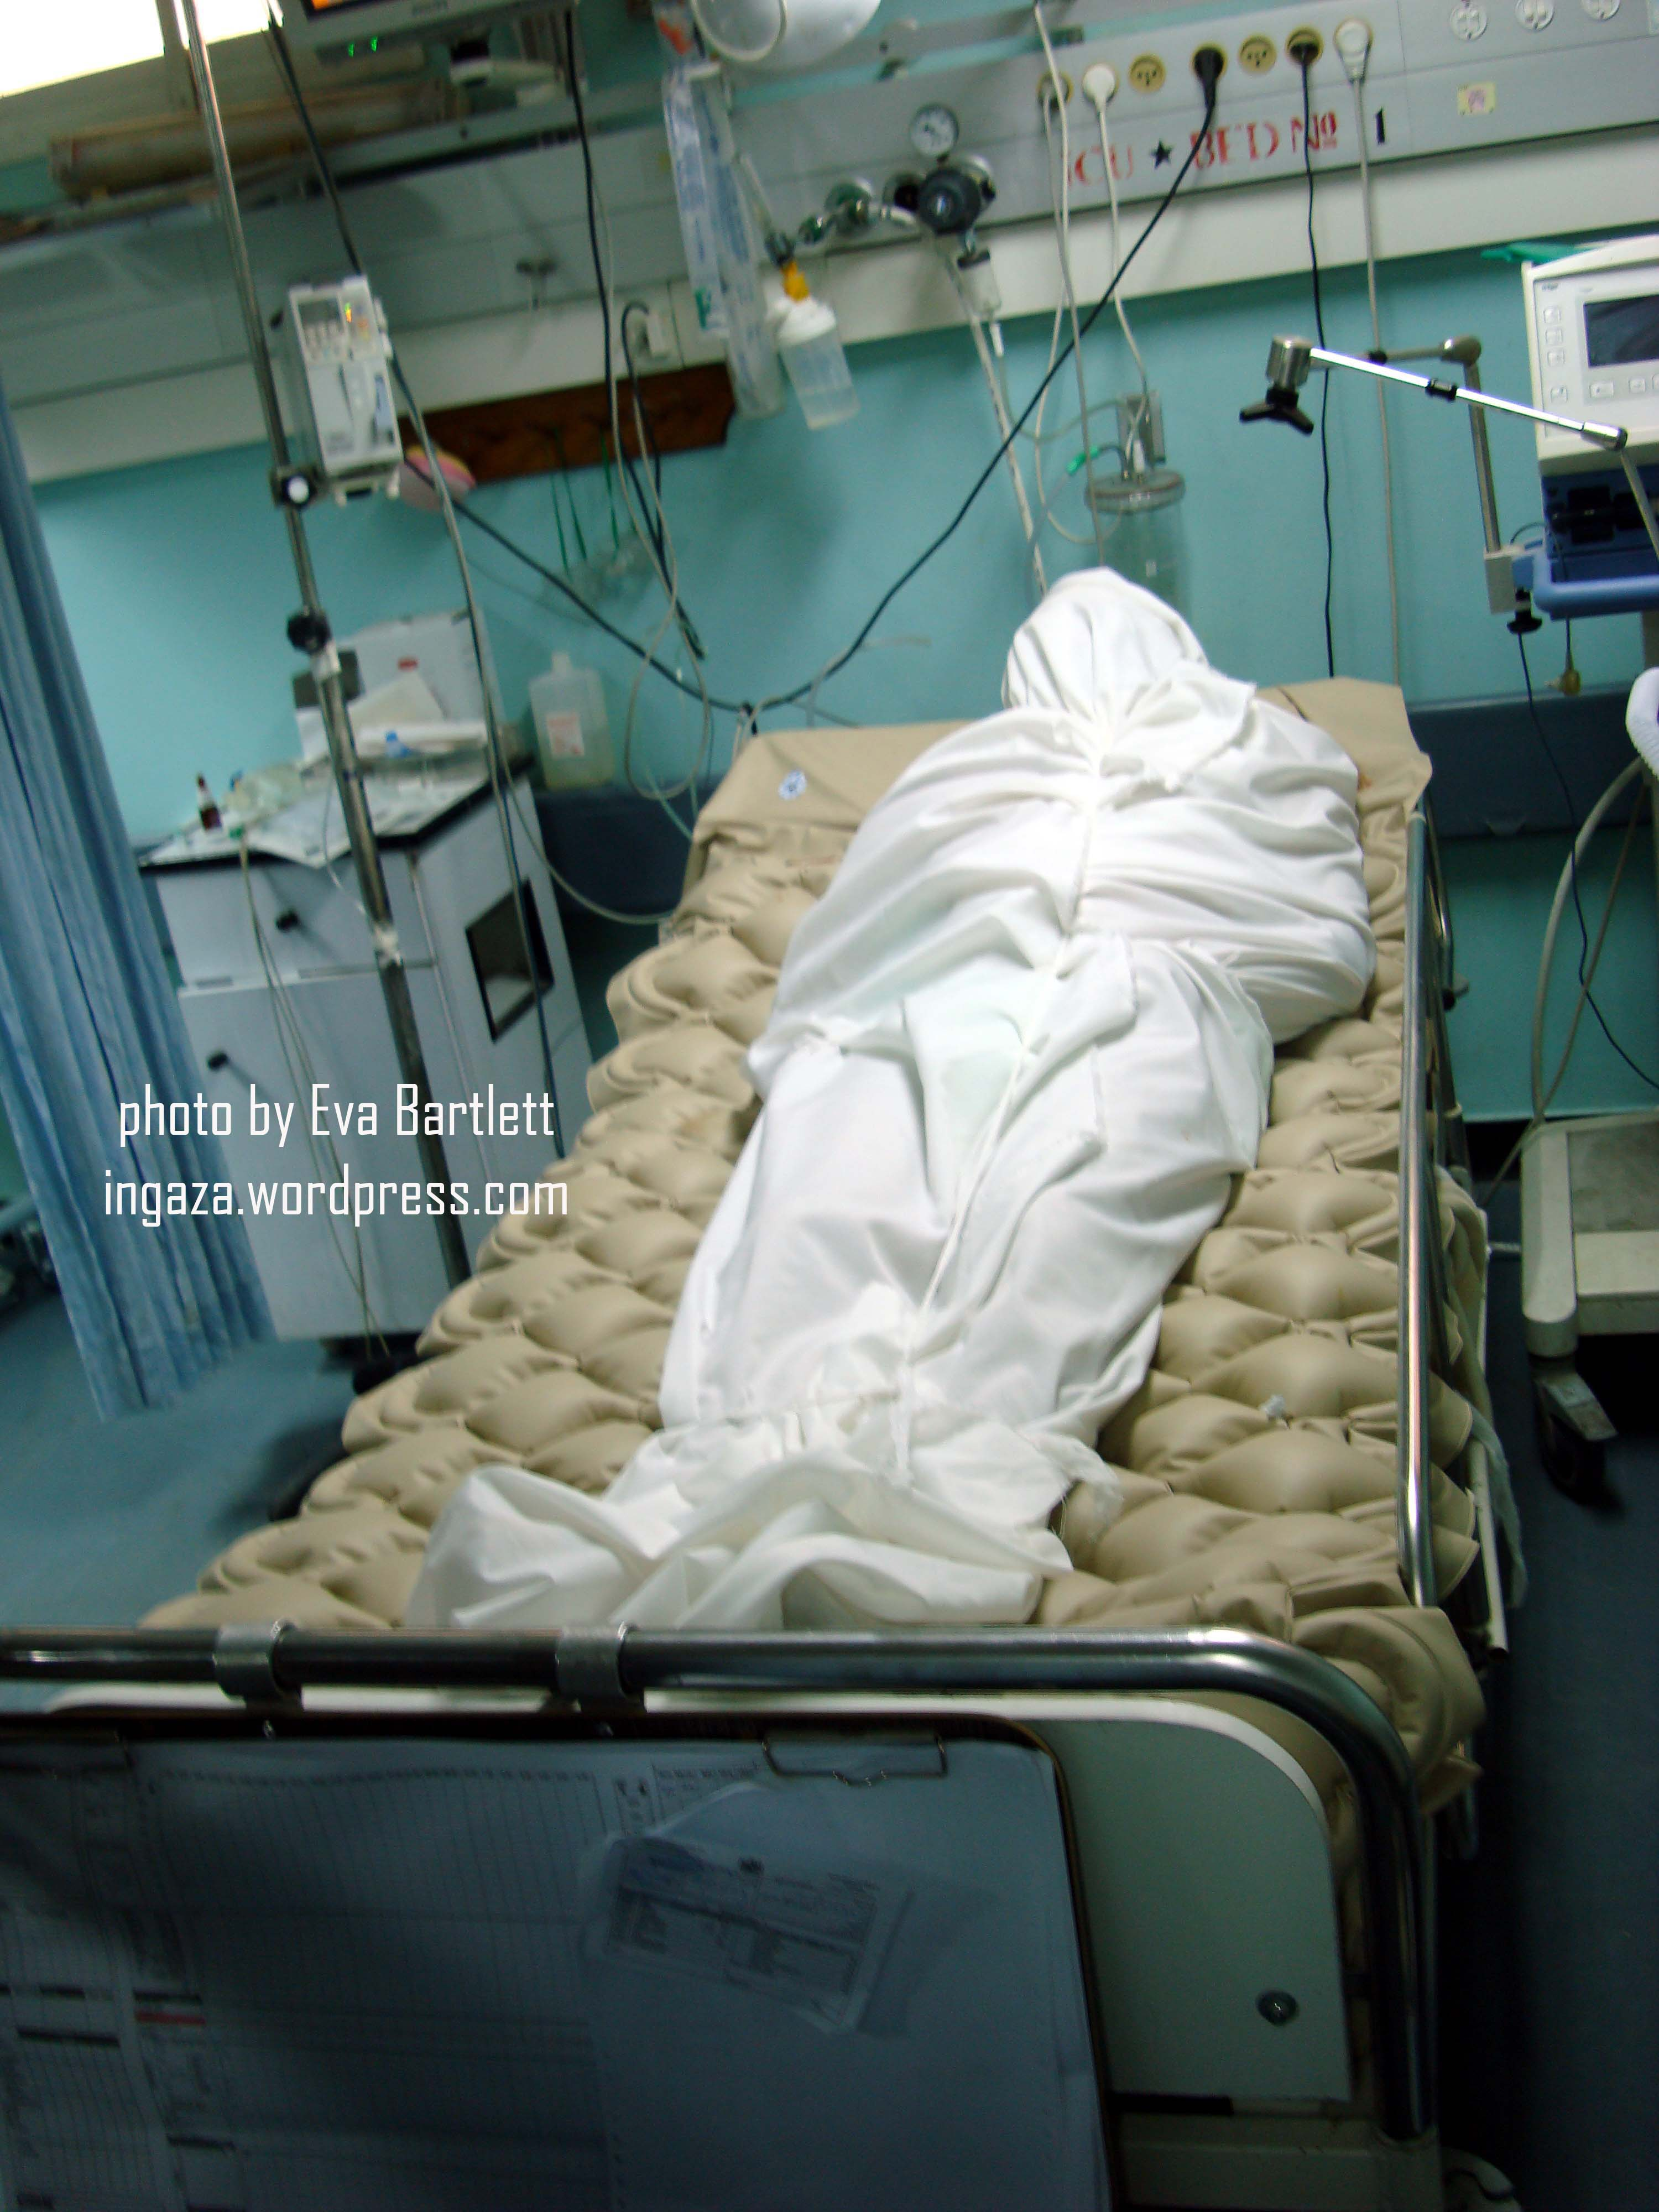 shifa icu a glimpse of hospital critical injuries in gaza